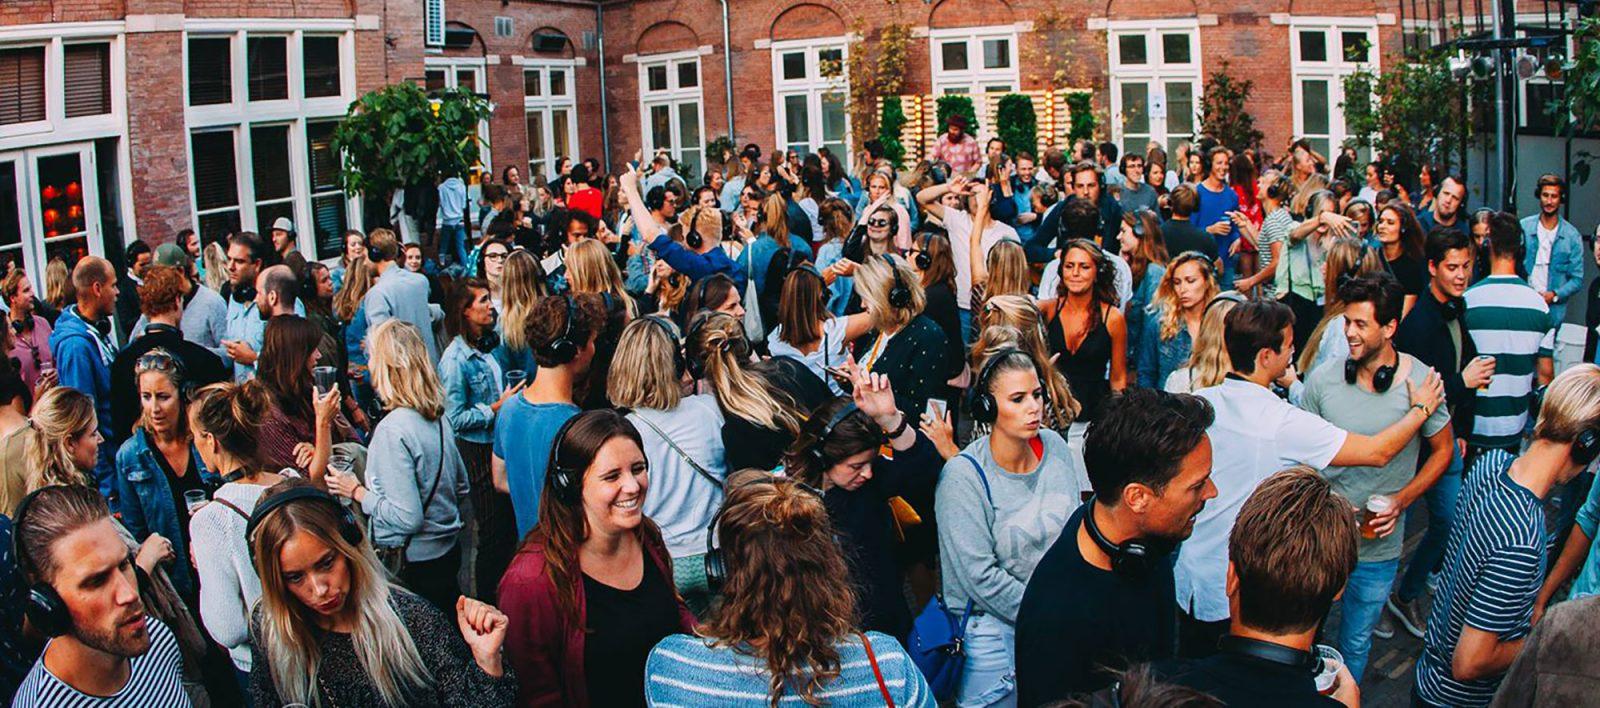 ROEF Rooftop Festival Amsterdam Vondel Disco